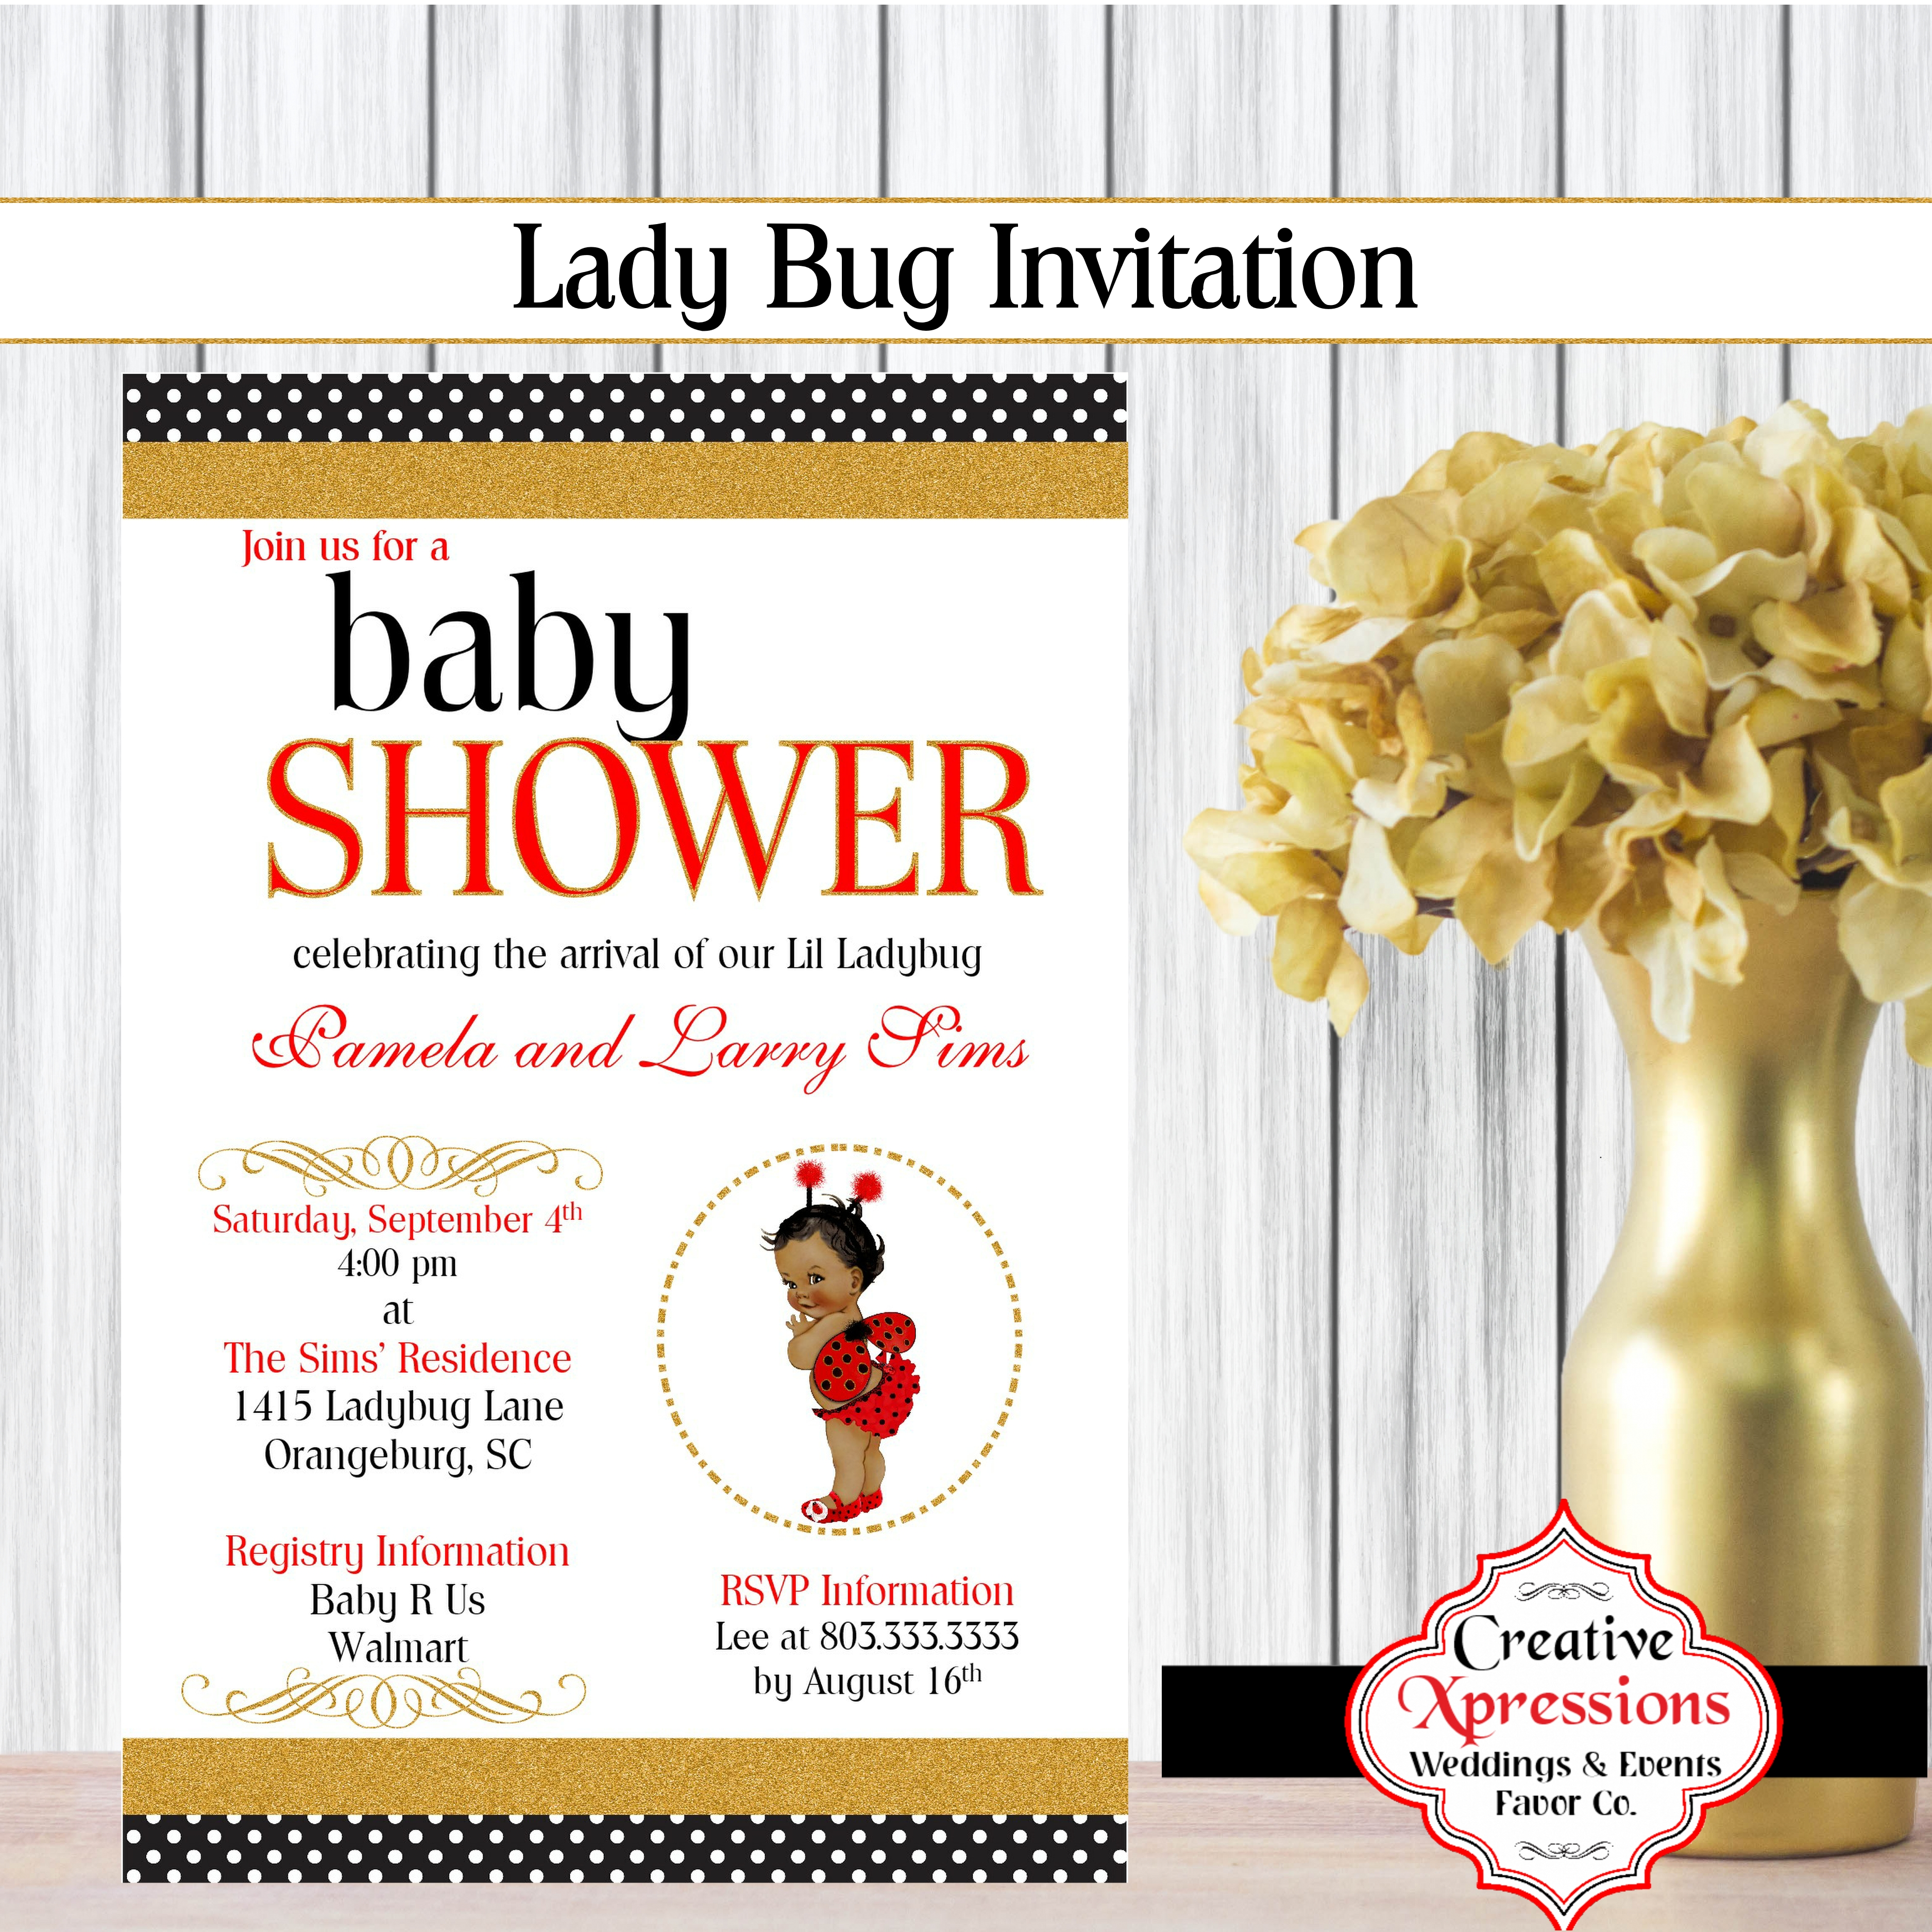 Gold, Red and Black Ladybug Shower Invitation